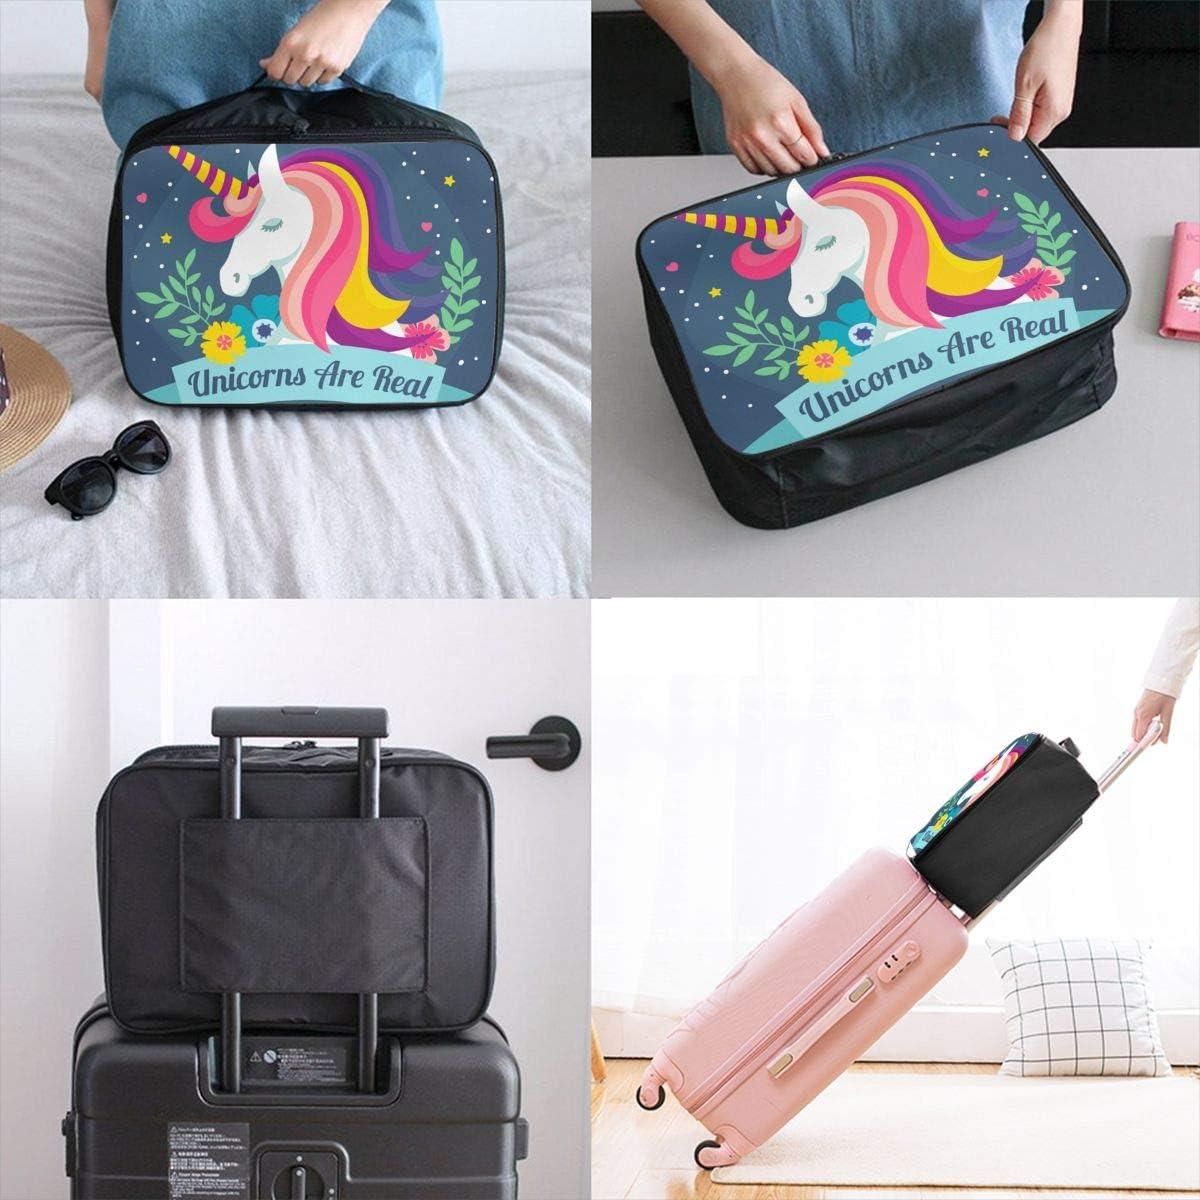 Culora Unicorns Are Real Lightweight Large Capacity Portable Luggage Bag